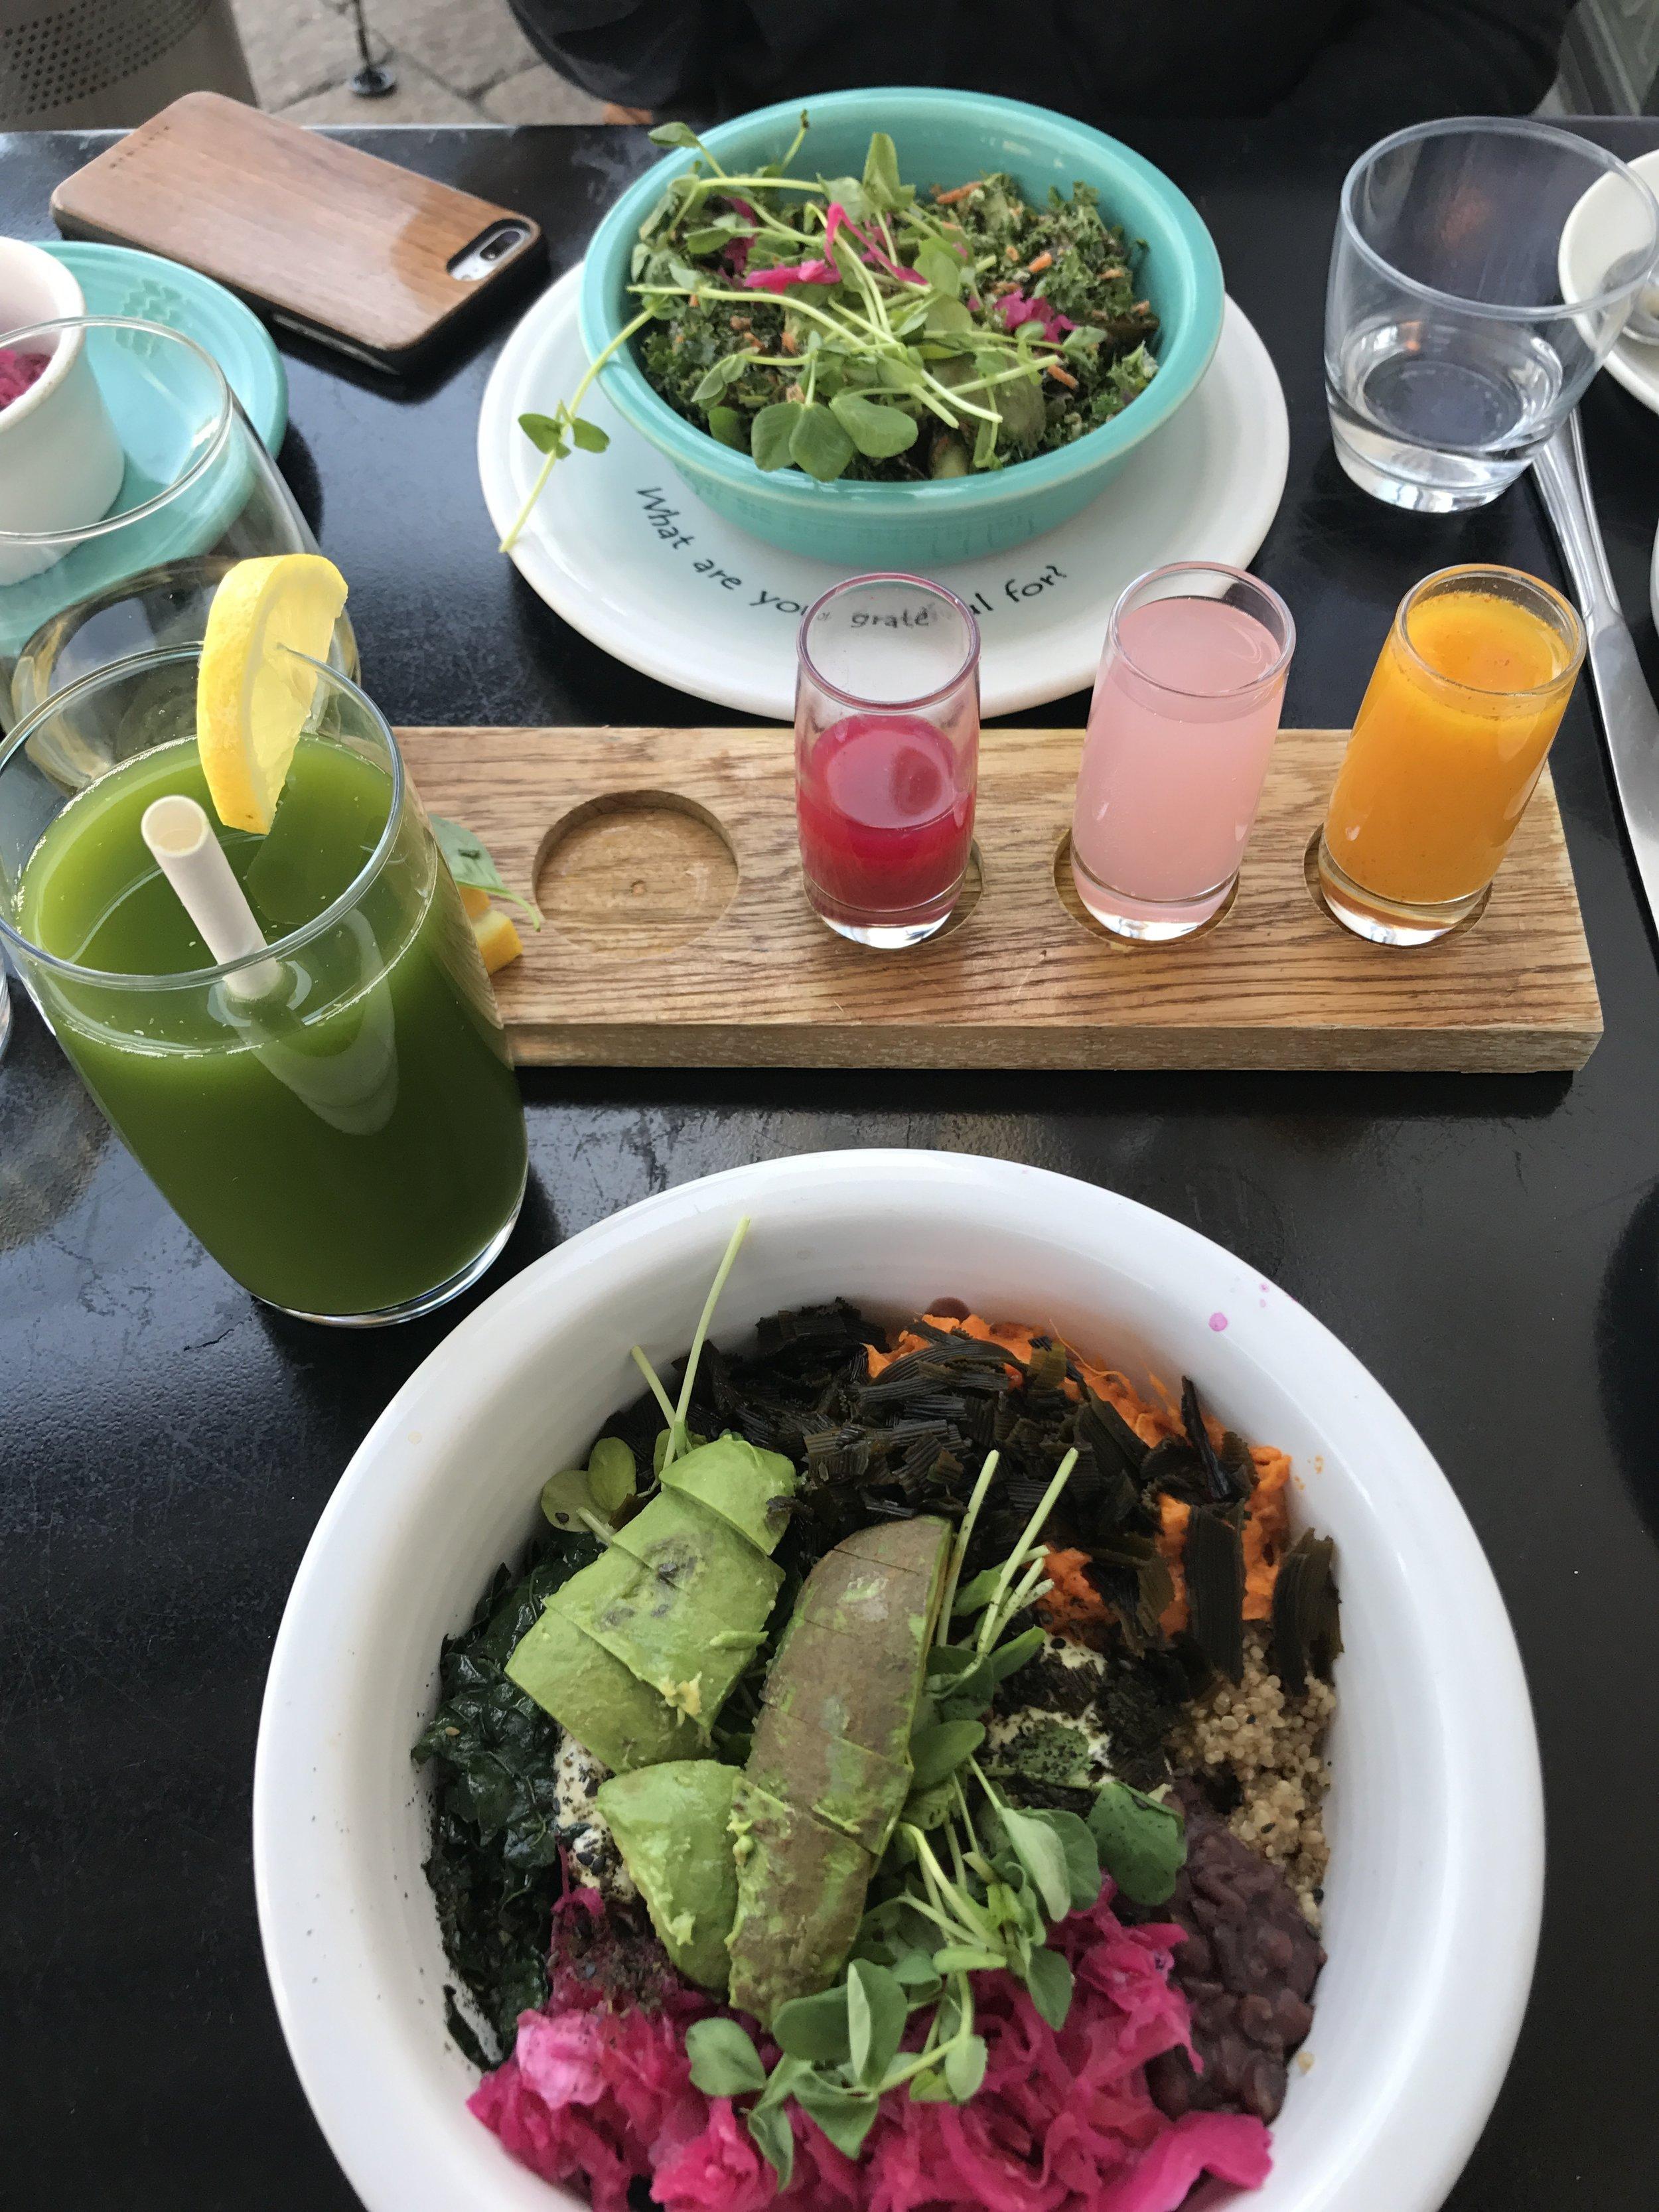 Whole bowl. Replenished pressed juice. Wellness flight.